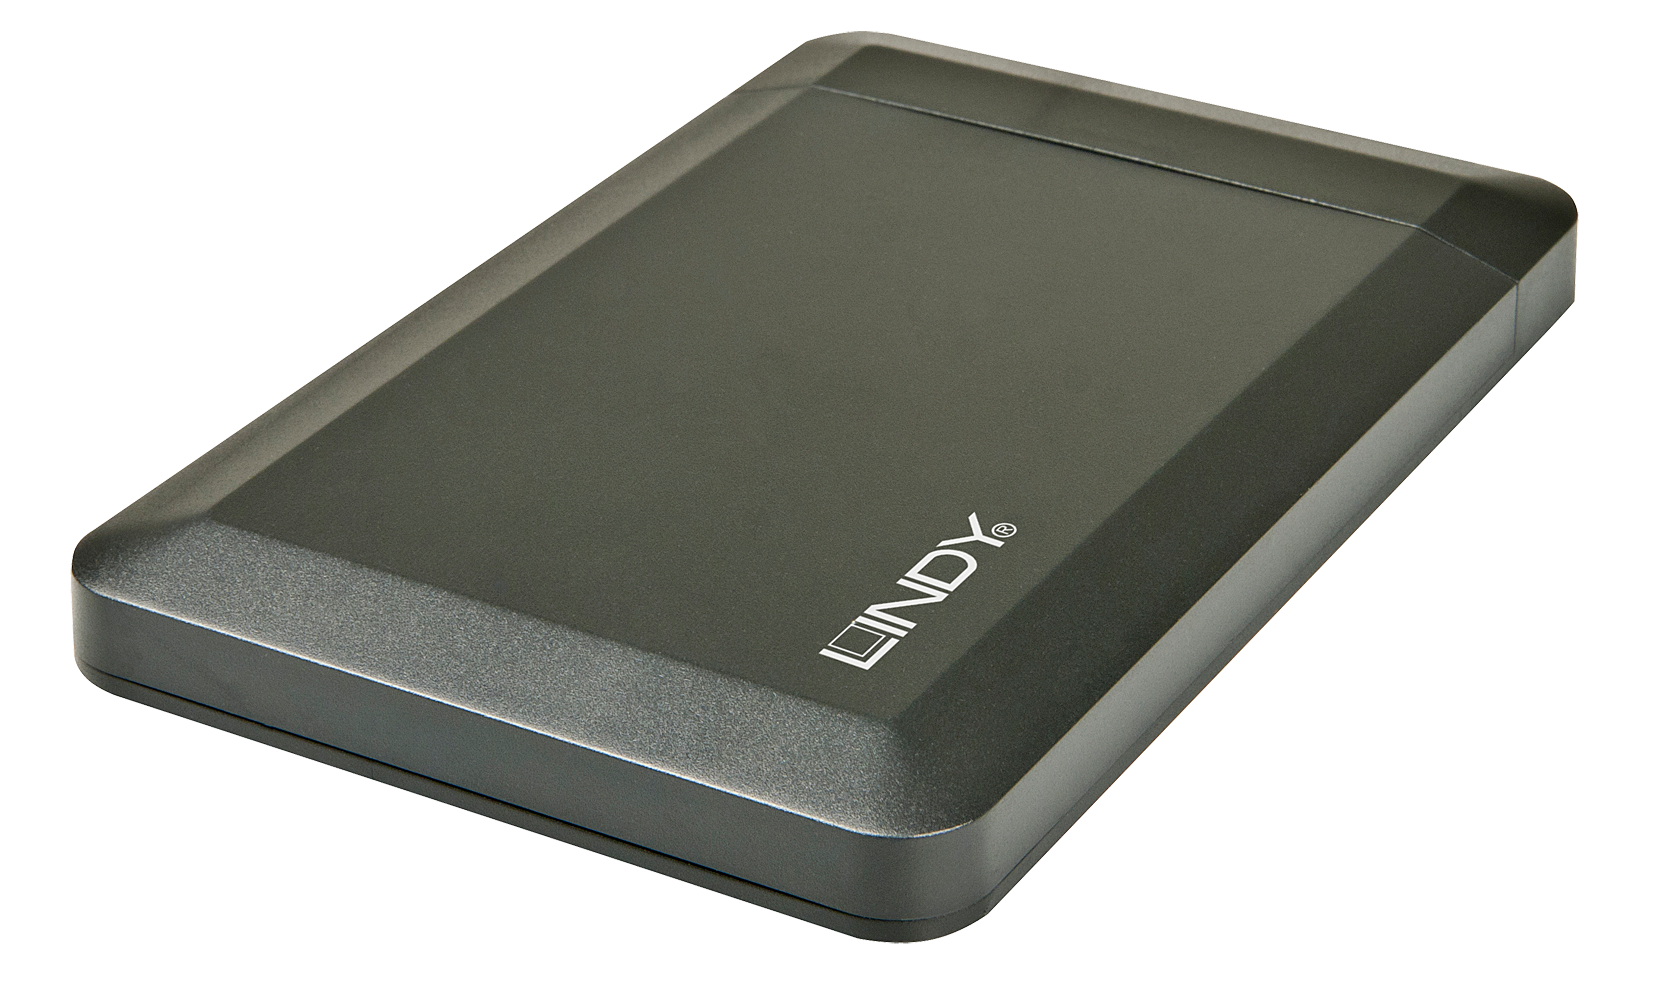 USB 3.0 SATA 2,5 Gehäuse Classic